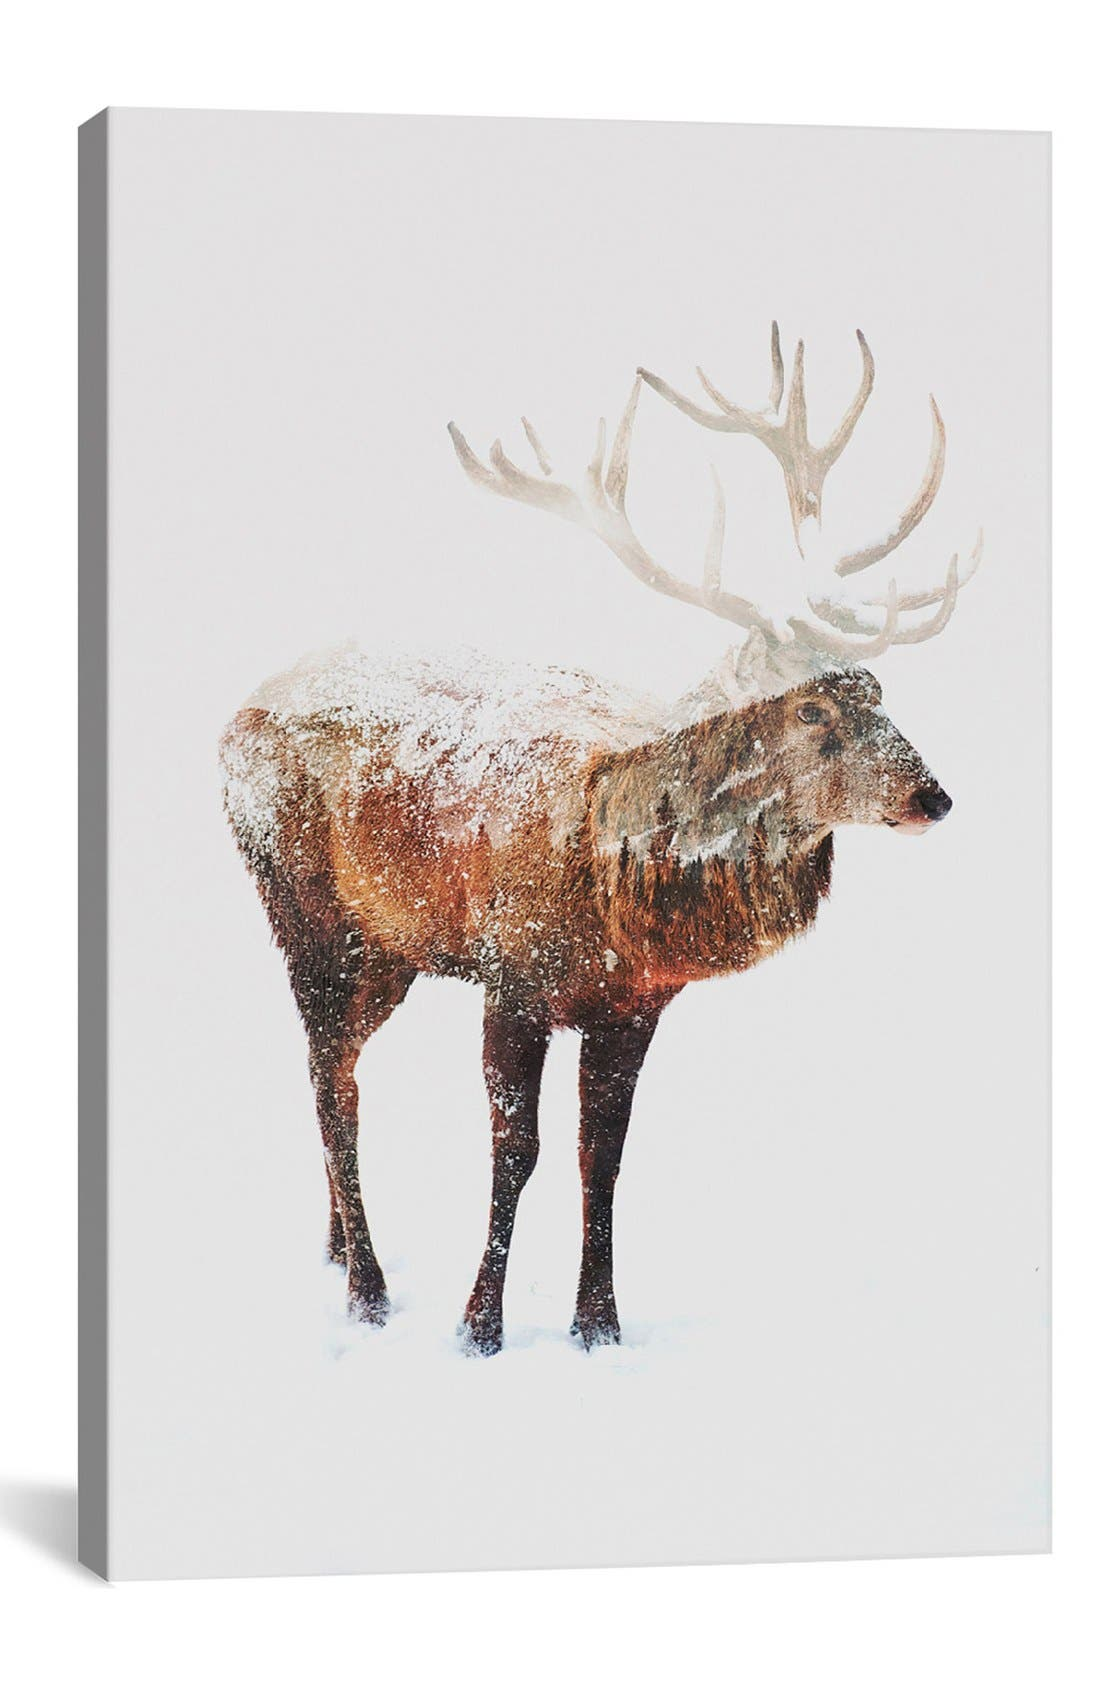 'Deer V' Giclée Print Canvas Art,                             Main thumbnail 1, color,                             200